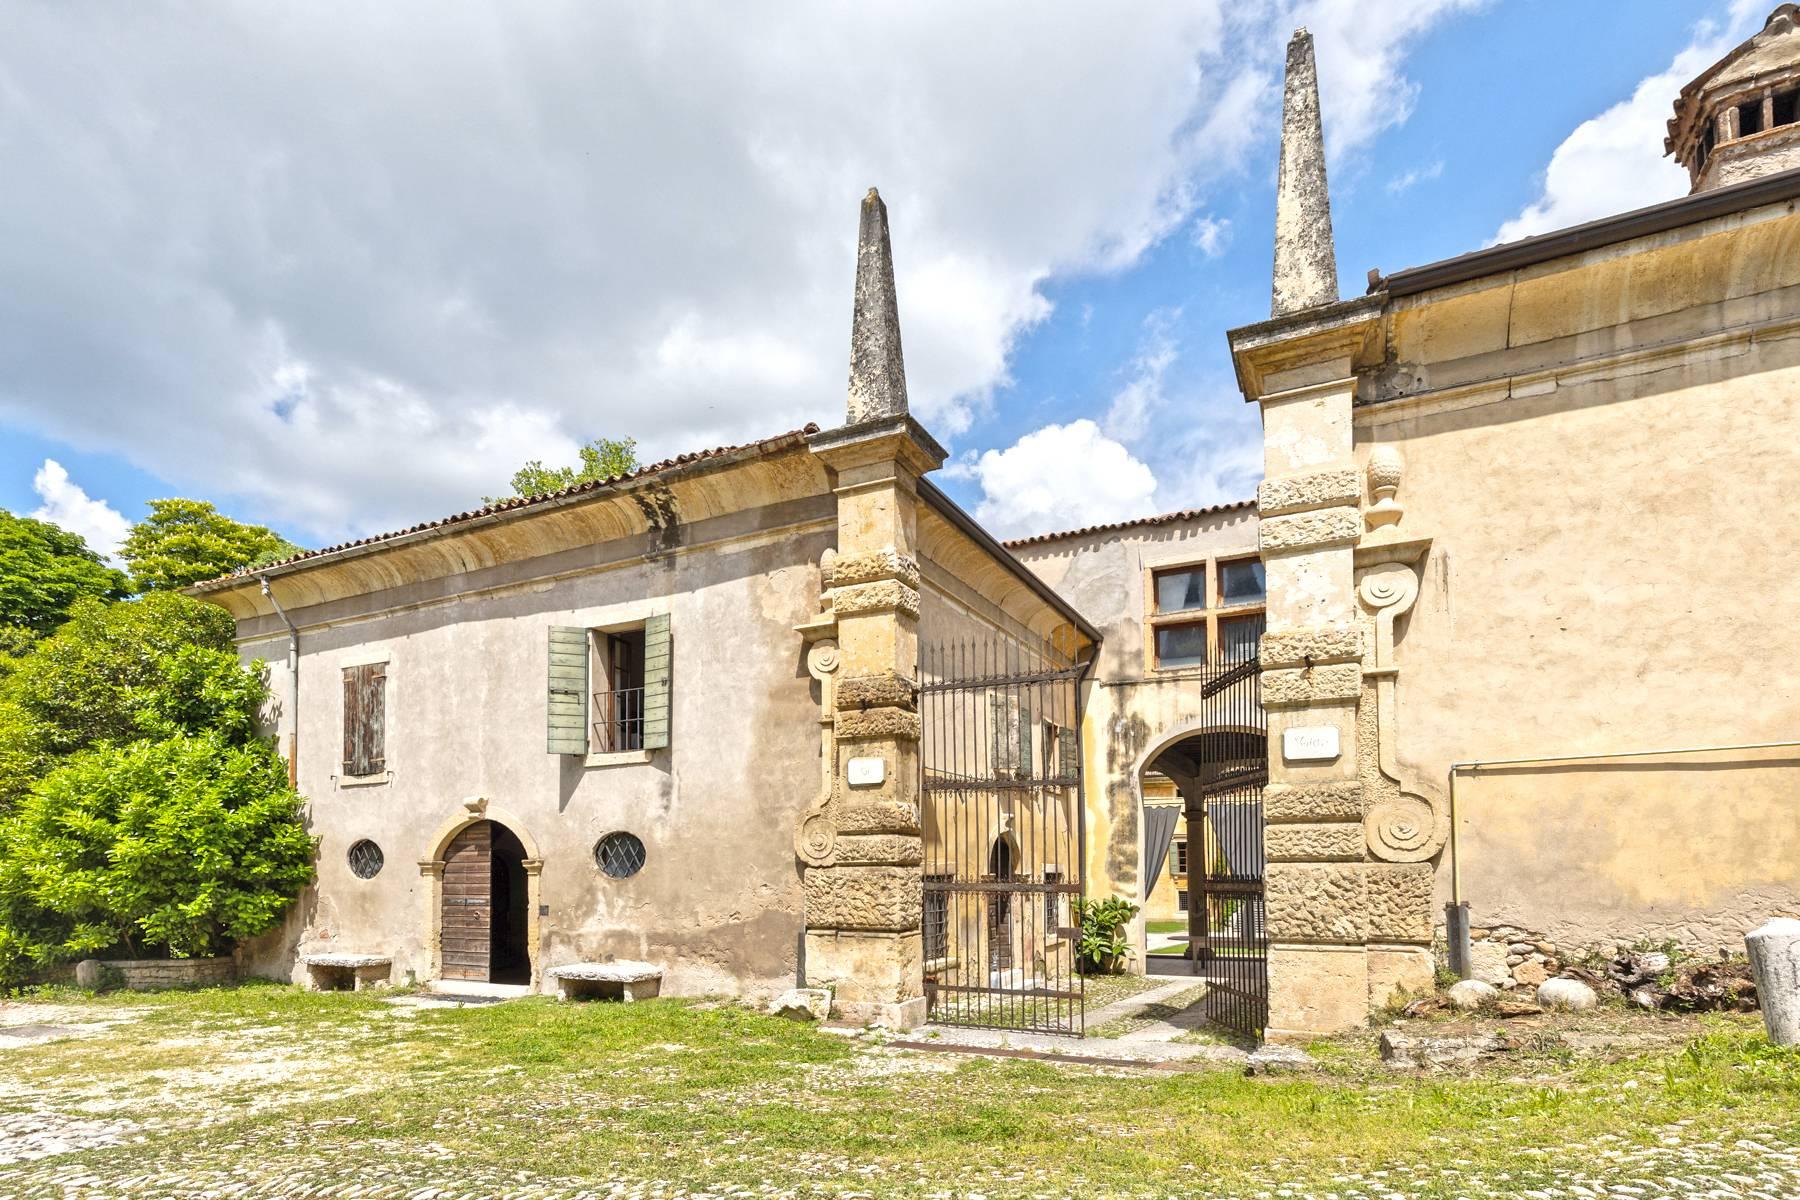 Villa in Vendita a Verona: 5 locali, 2400 mq - Foto 14